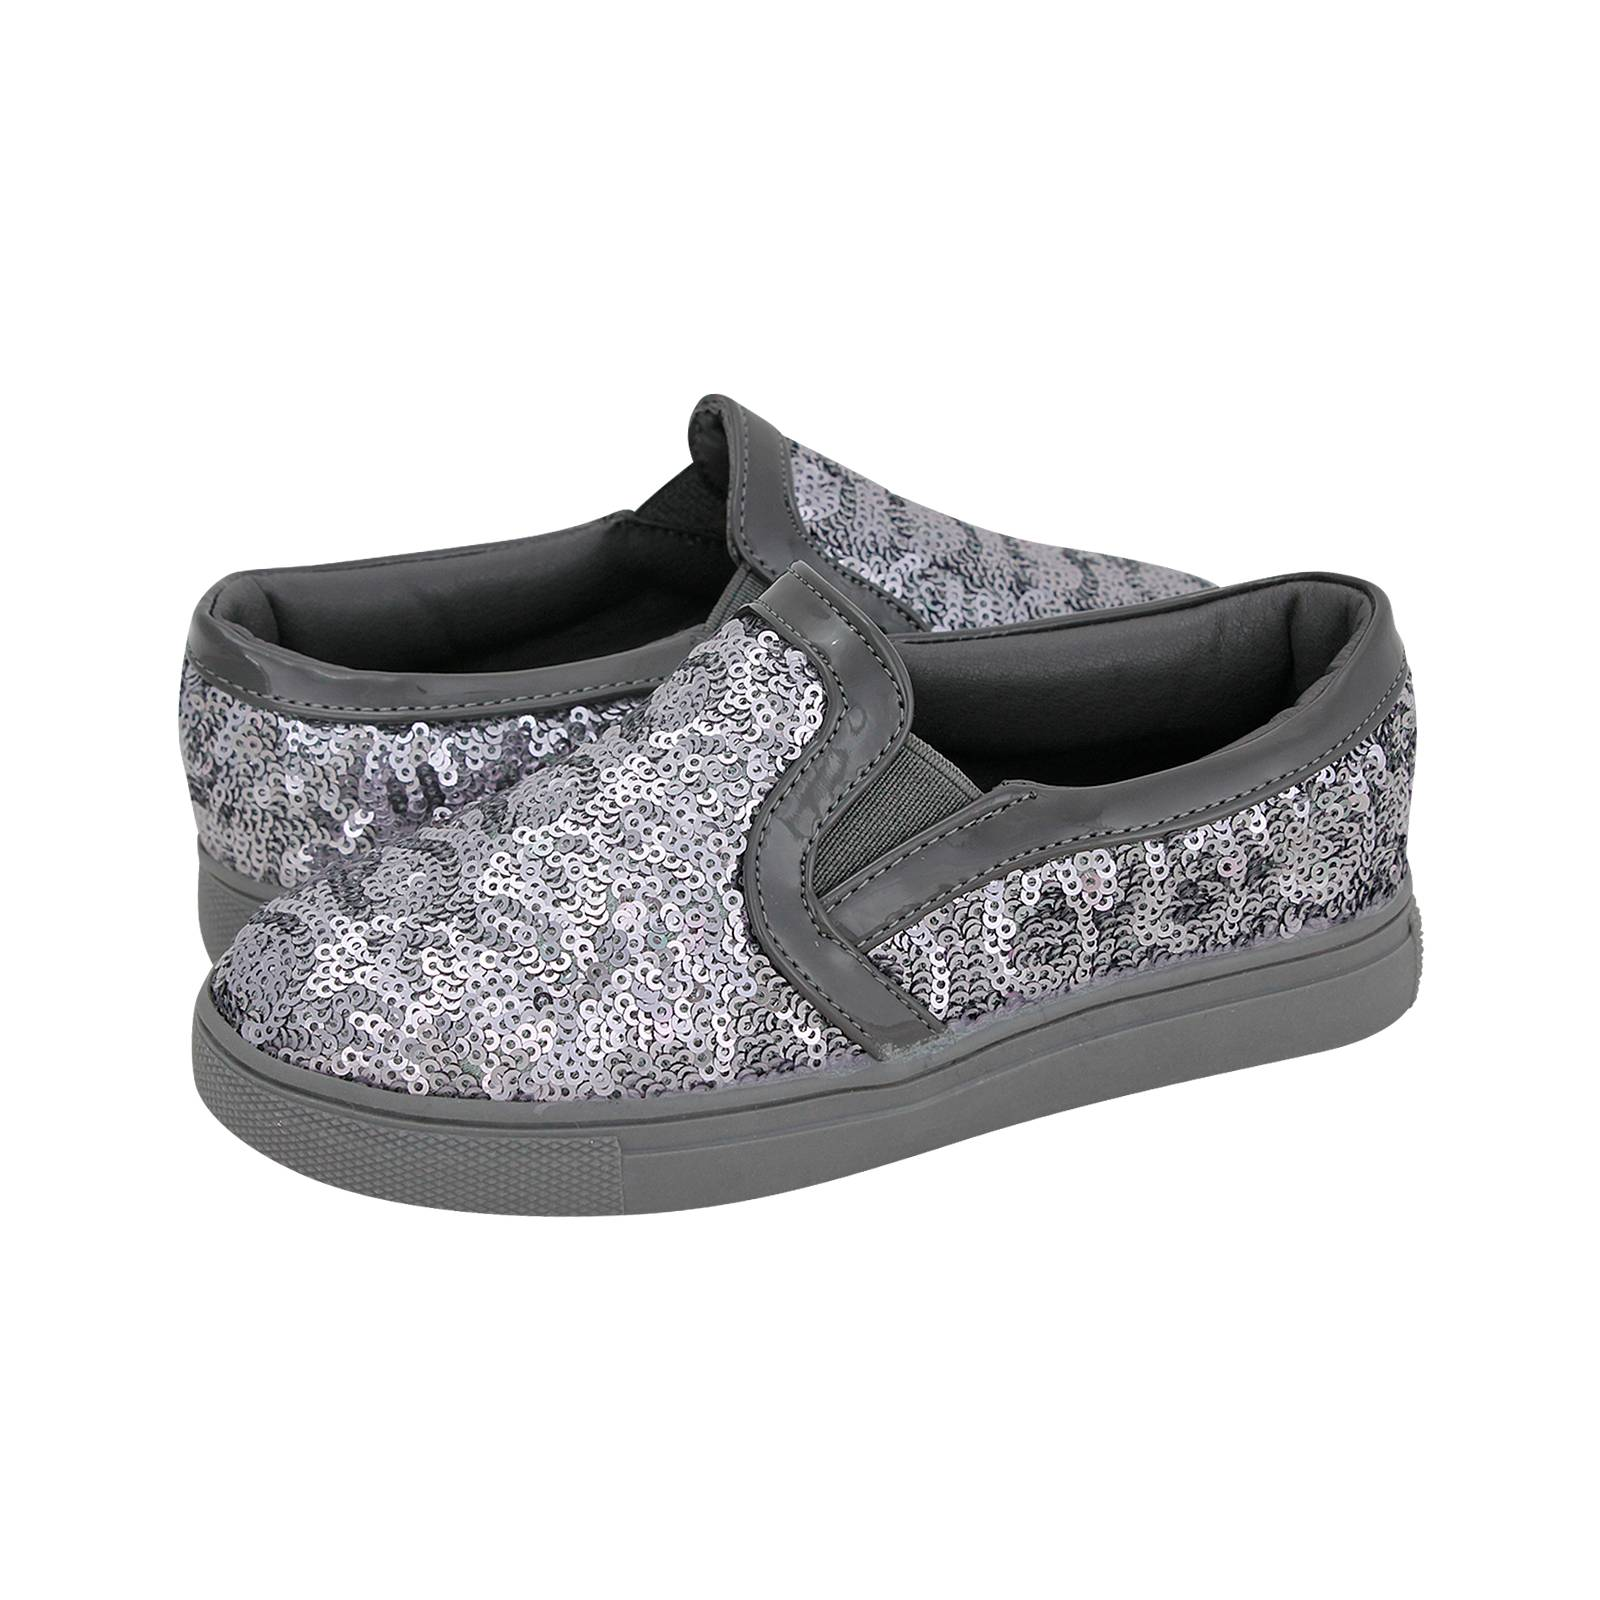 dc4bad17e31 Cofete - Παιδικά παπούτσια casual Energy από παγιετες, υφασμα και ...